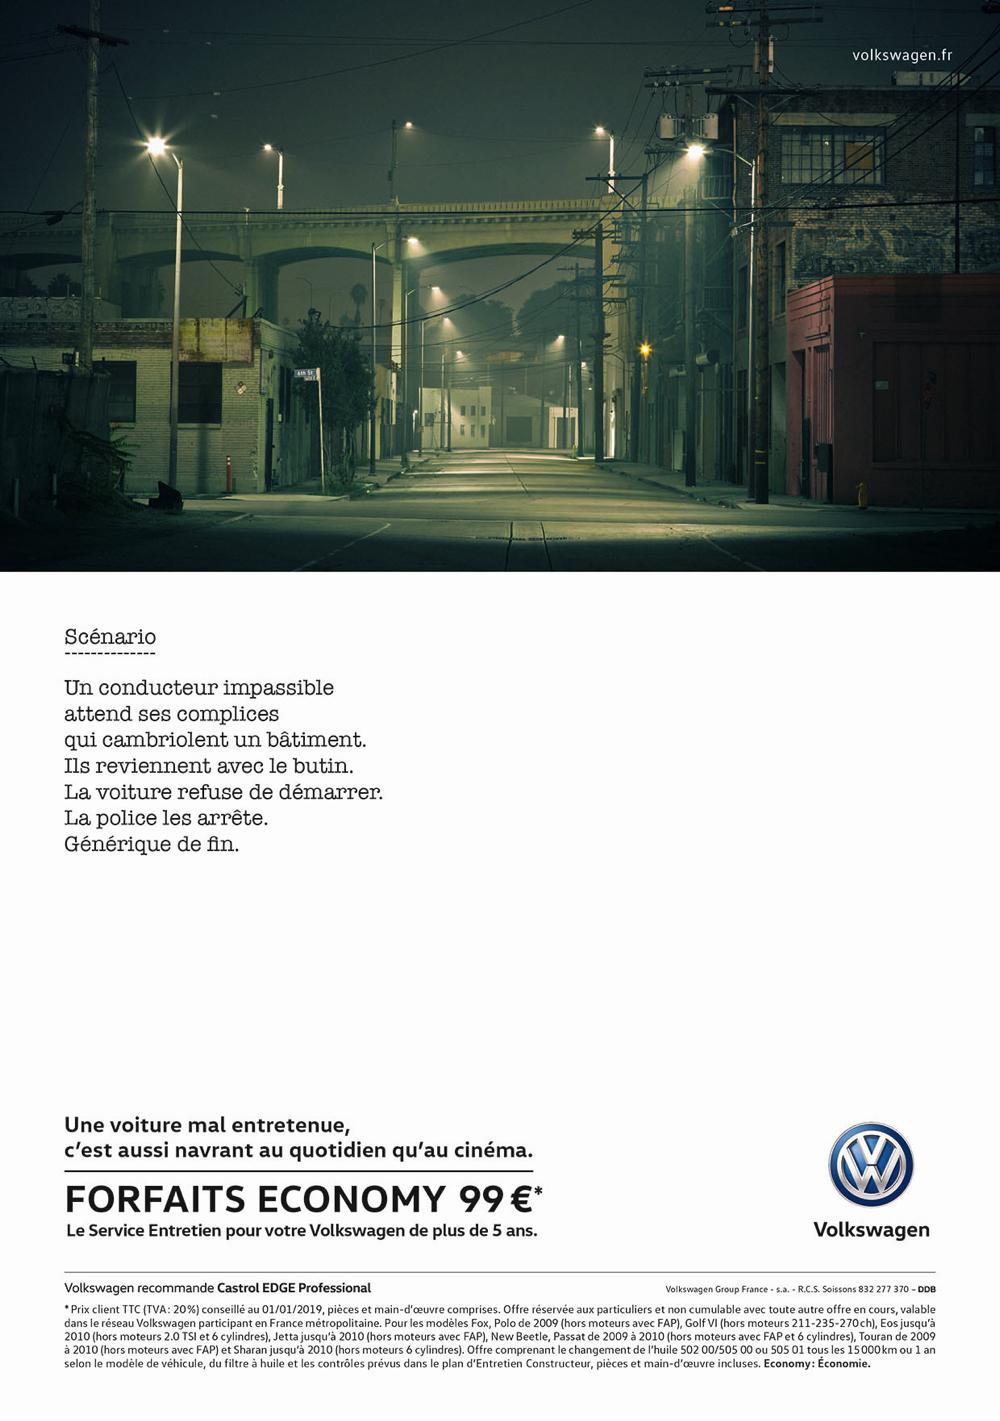 VW ENTRETIEN AUTO img1